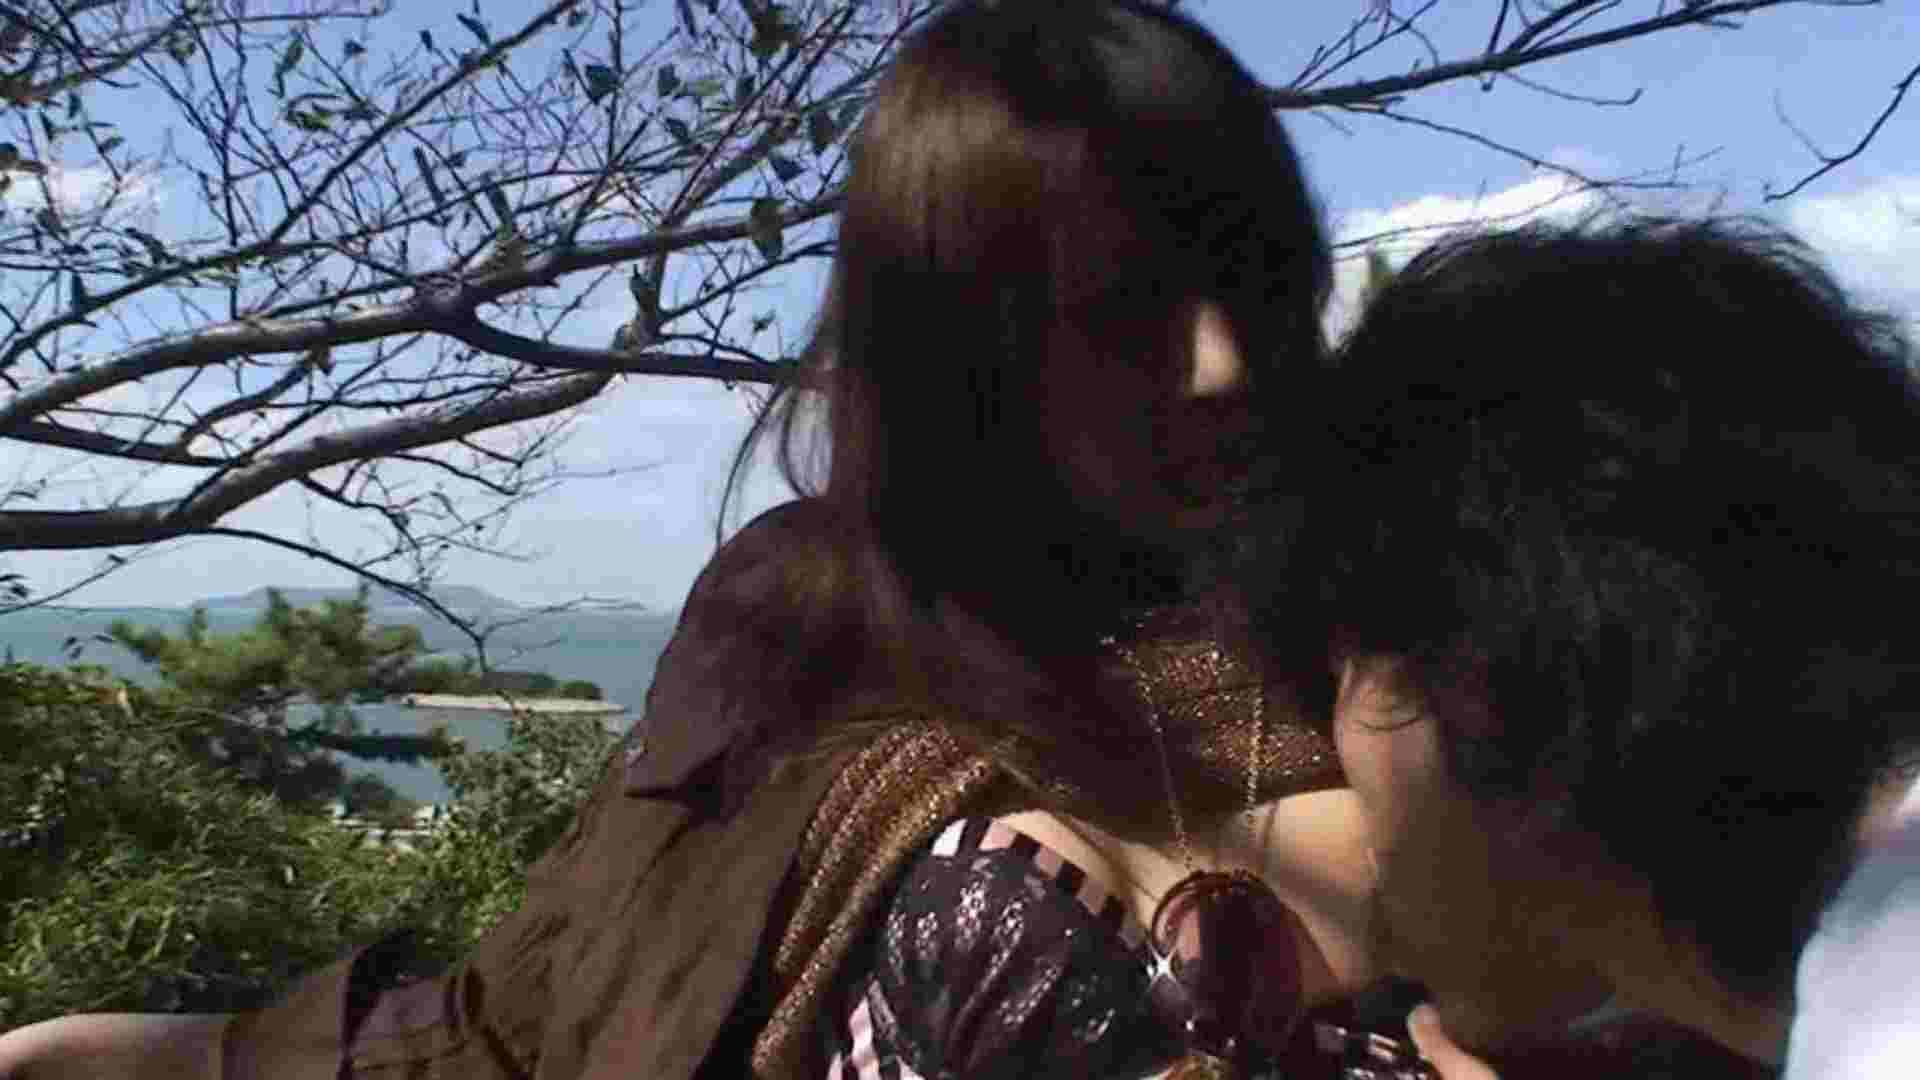 S級厳選美女ビッチガールVol.03 OLセックス 隠し撮りオマンコ動画紹介 80画像 6